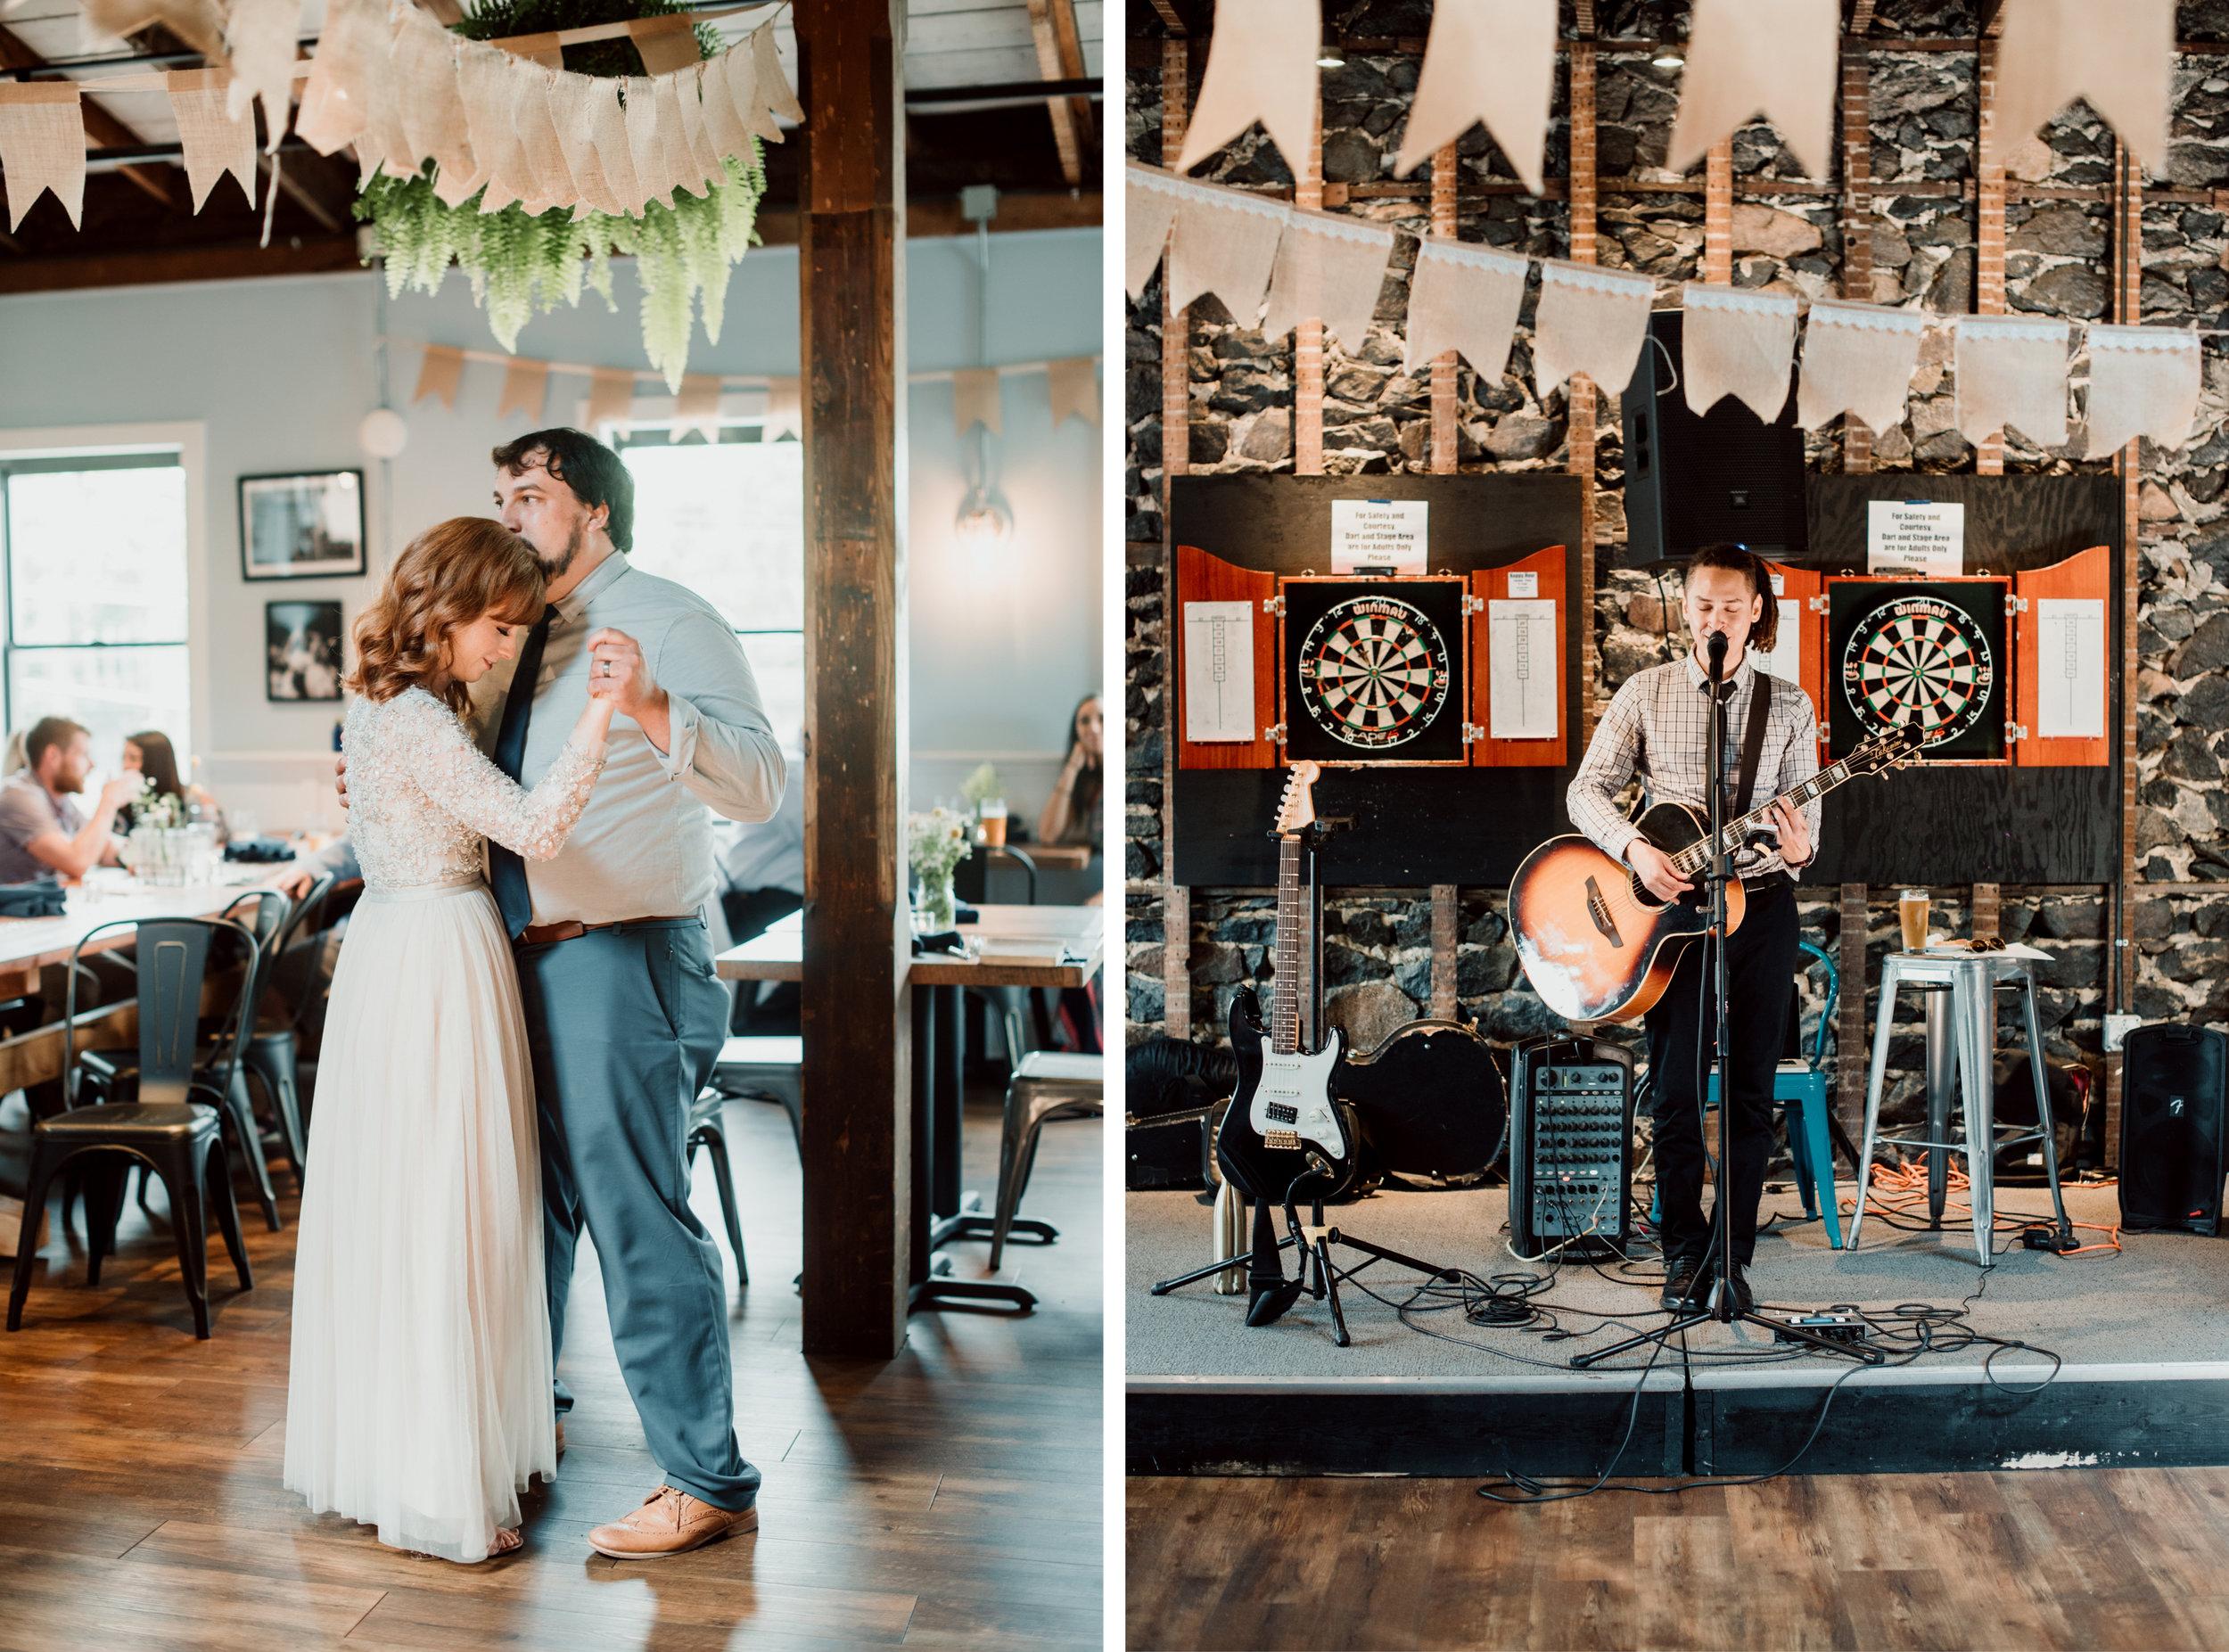 Philadelphia-wedding-photographer-la-cabra-brewery-diy-Peaberry-Photography-042.jpg